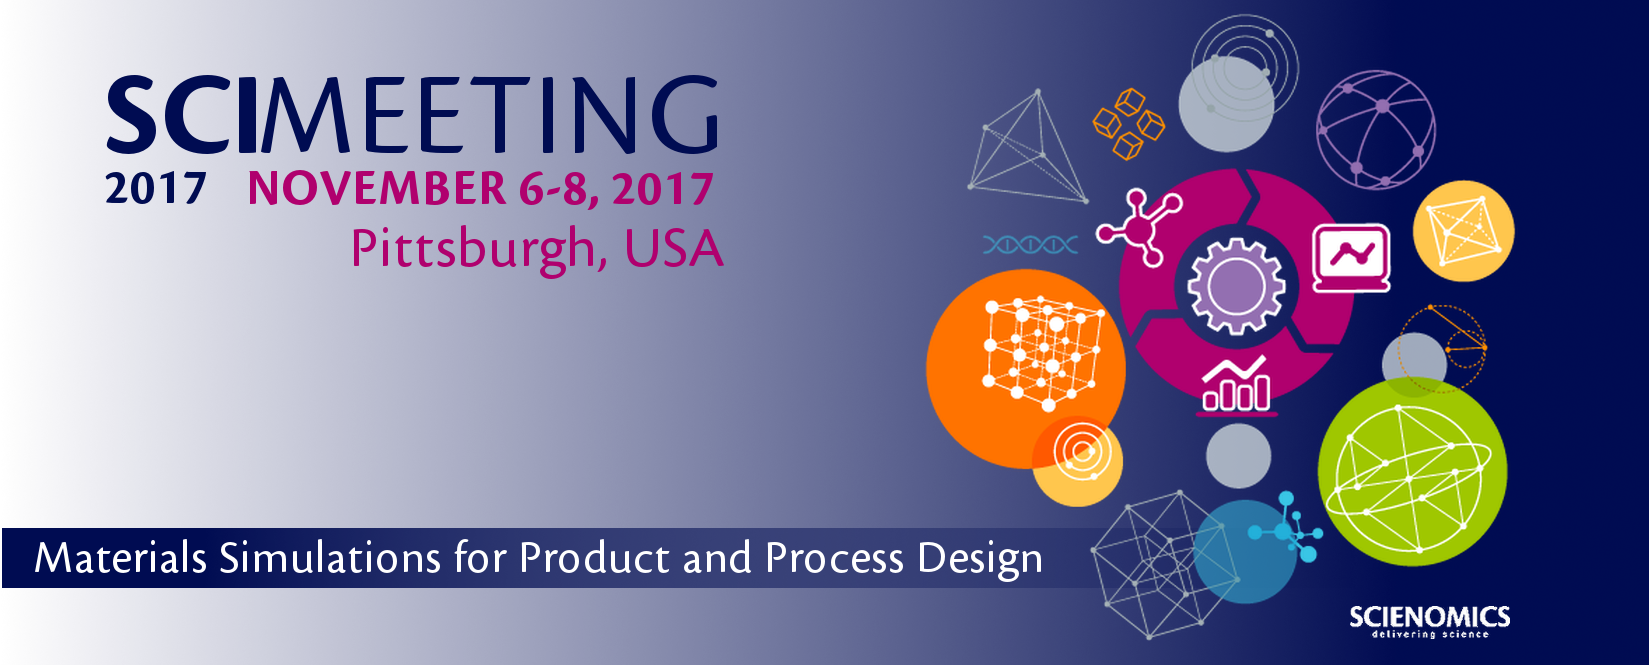 SciMeeting-USA-2017-web-banner